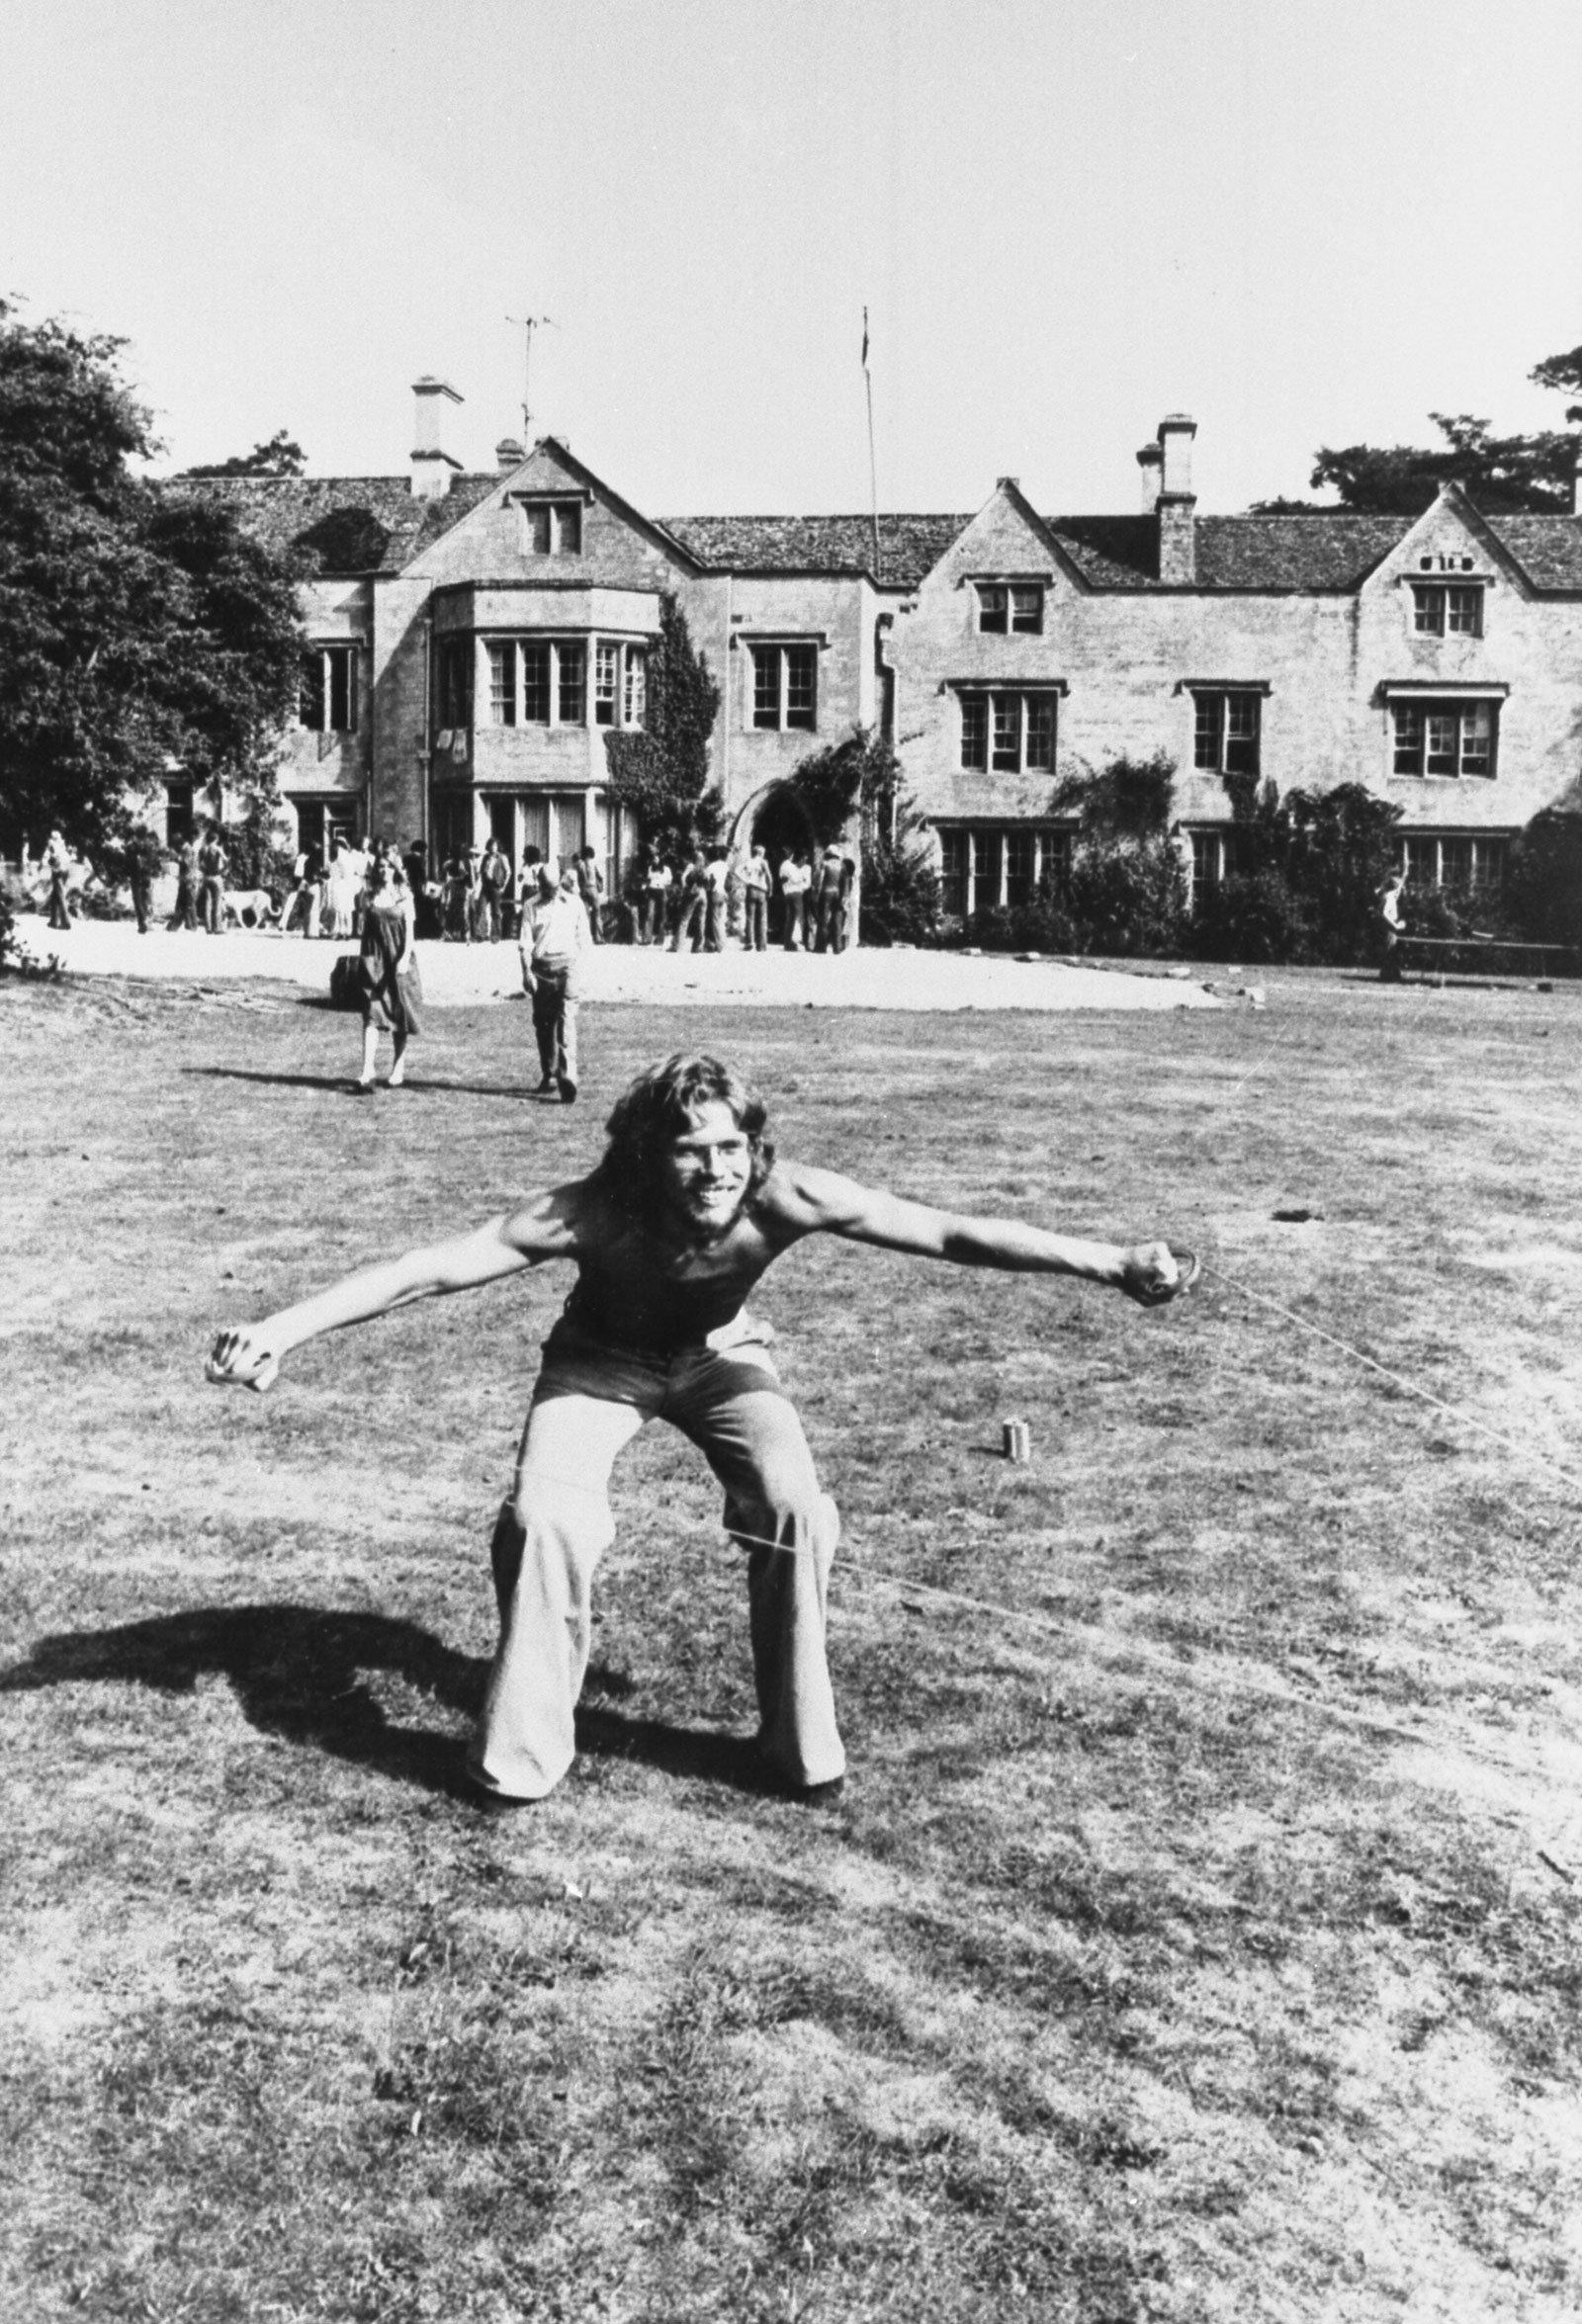 Richard Branson at the Manor